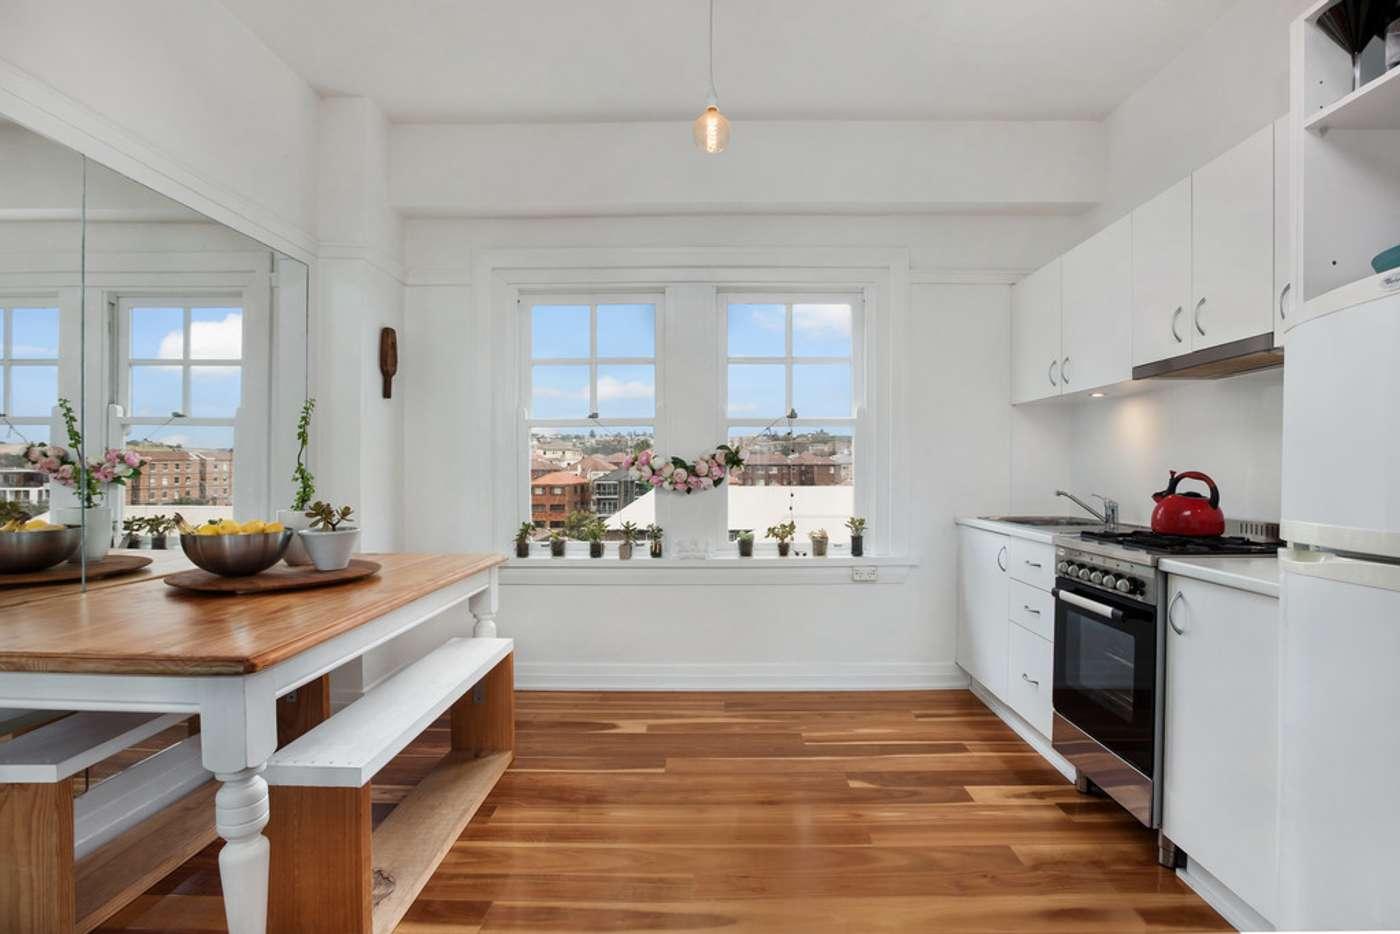 Main view of Homely apartment listing, 48/1 Beach Road, Bondi Beach NSW 2026